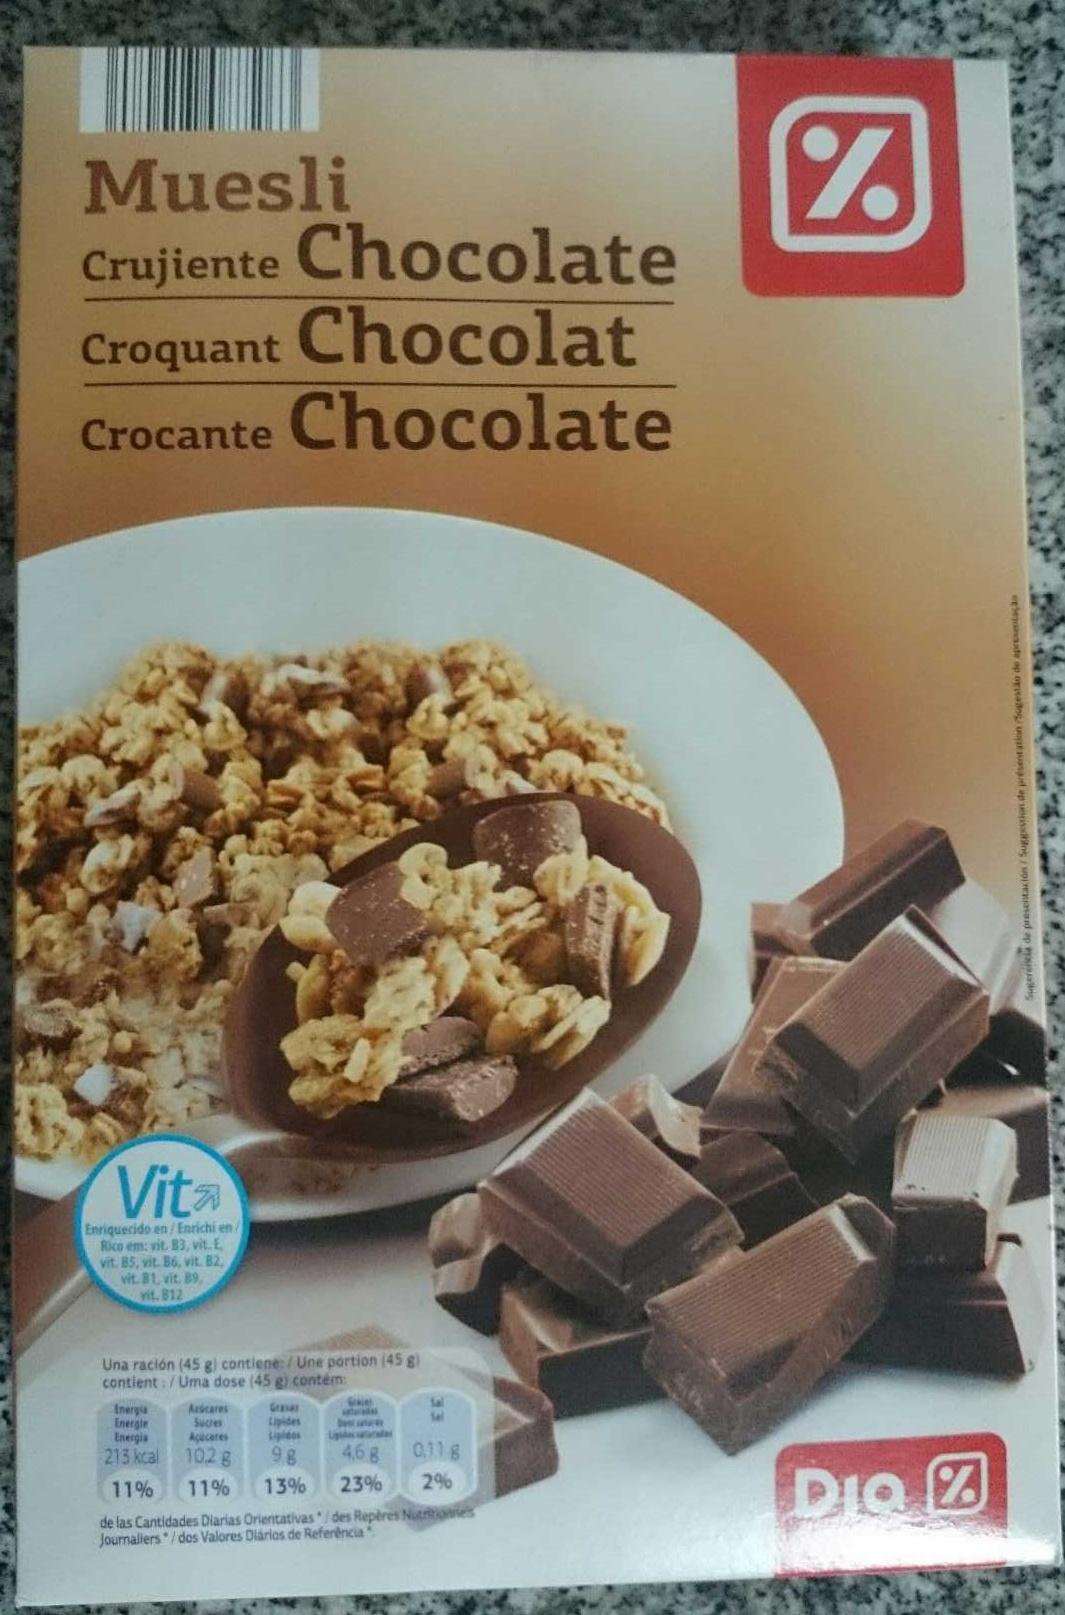 Muesli crujiente con chocolate negro - Producte